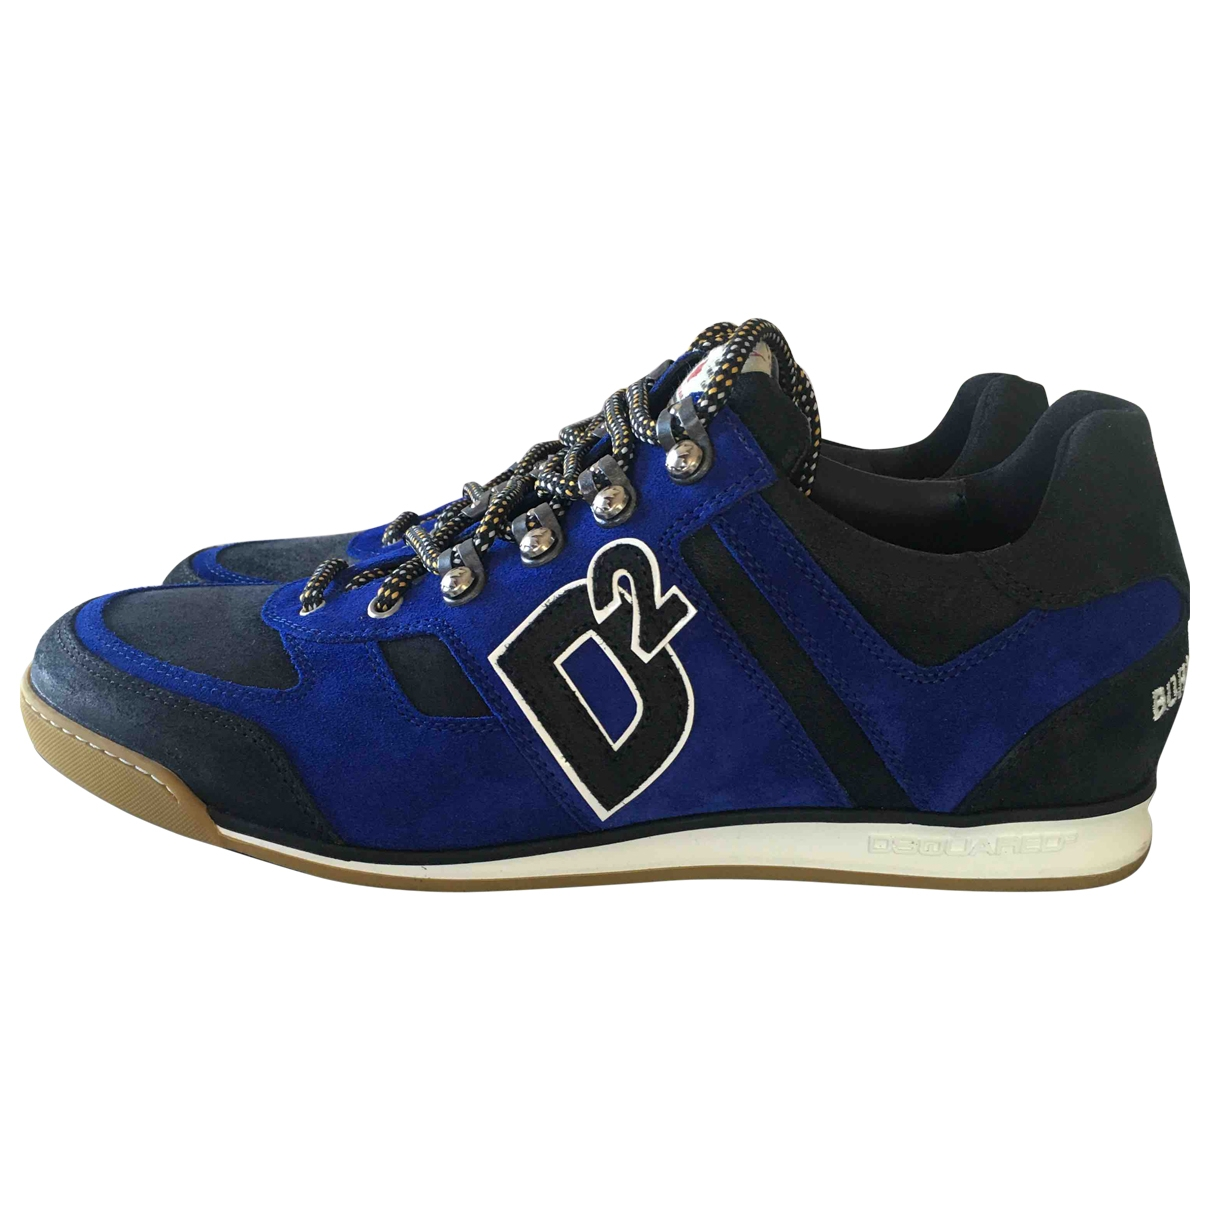 Dsquared2 251 Blue Cloth Trainers for Men 43 EU